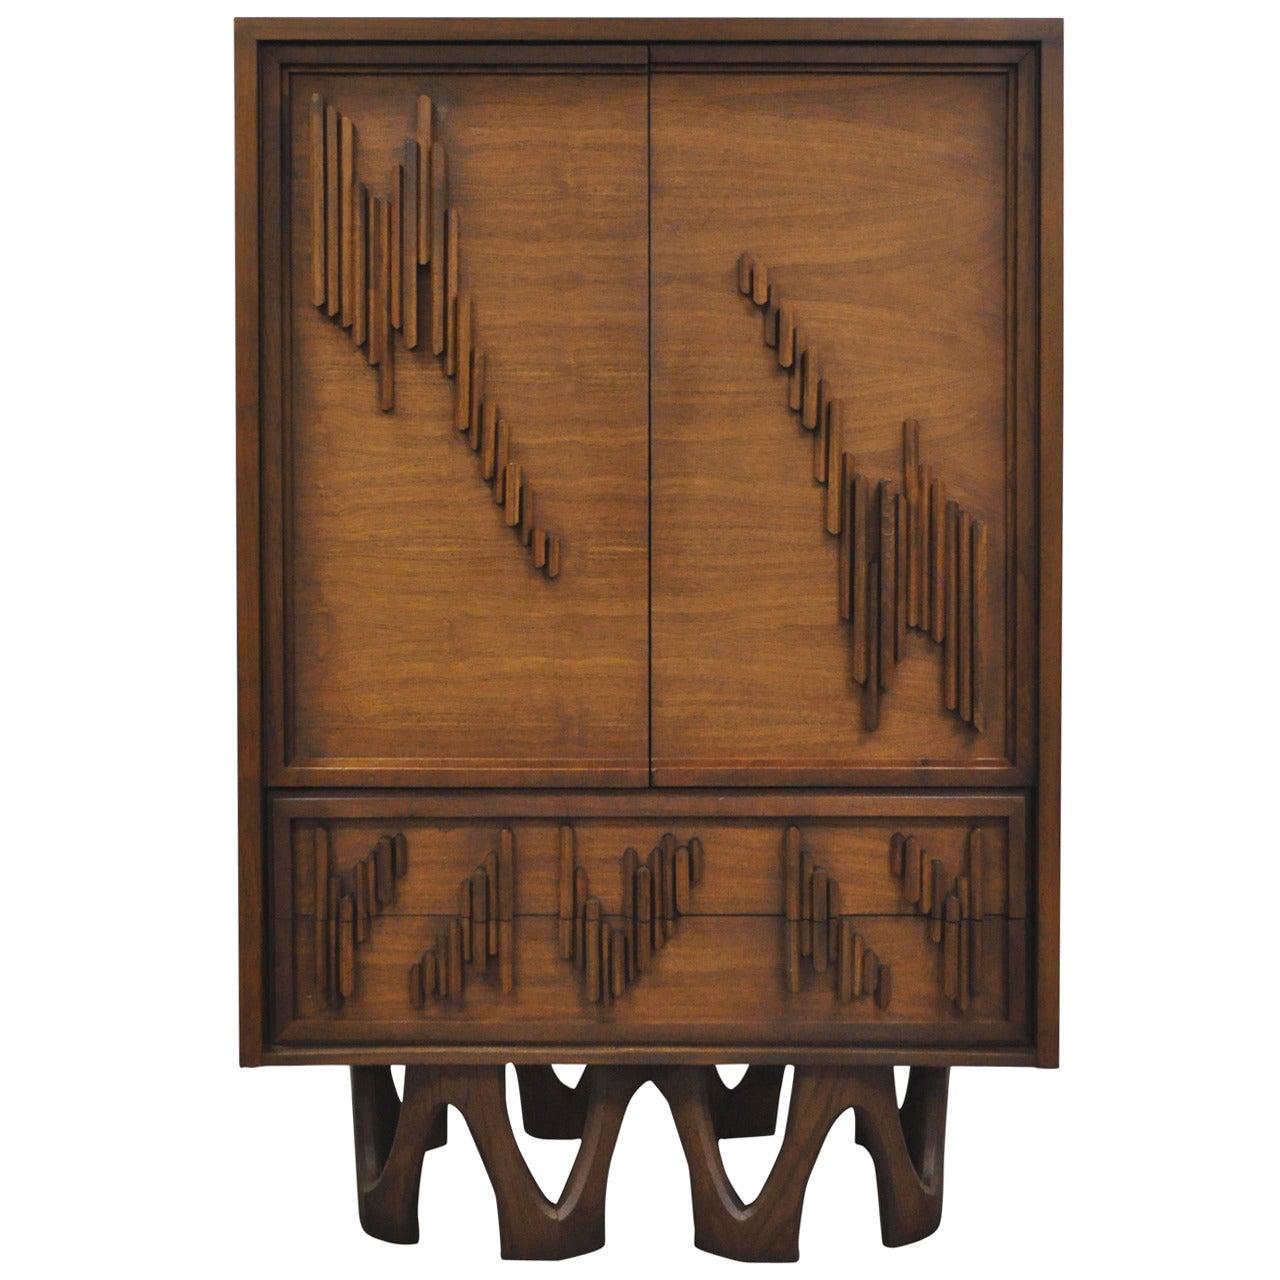 Mid Century Modern Brutalist Walnut Armoire Dresser Tall Chest after Paul Evans